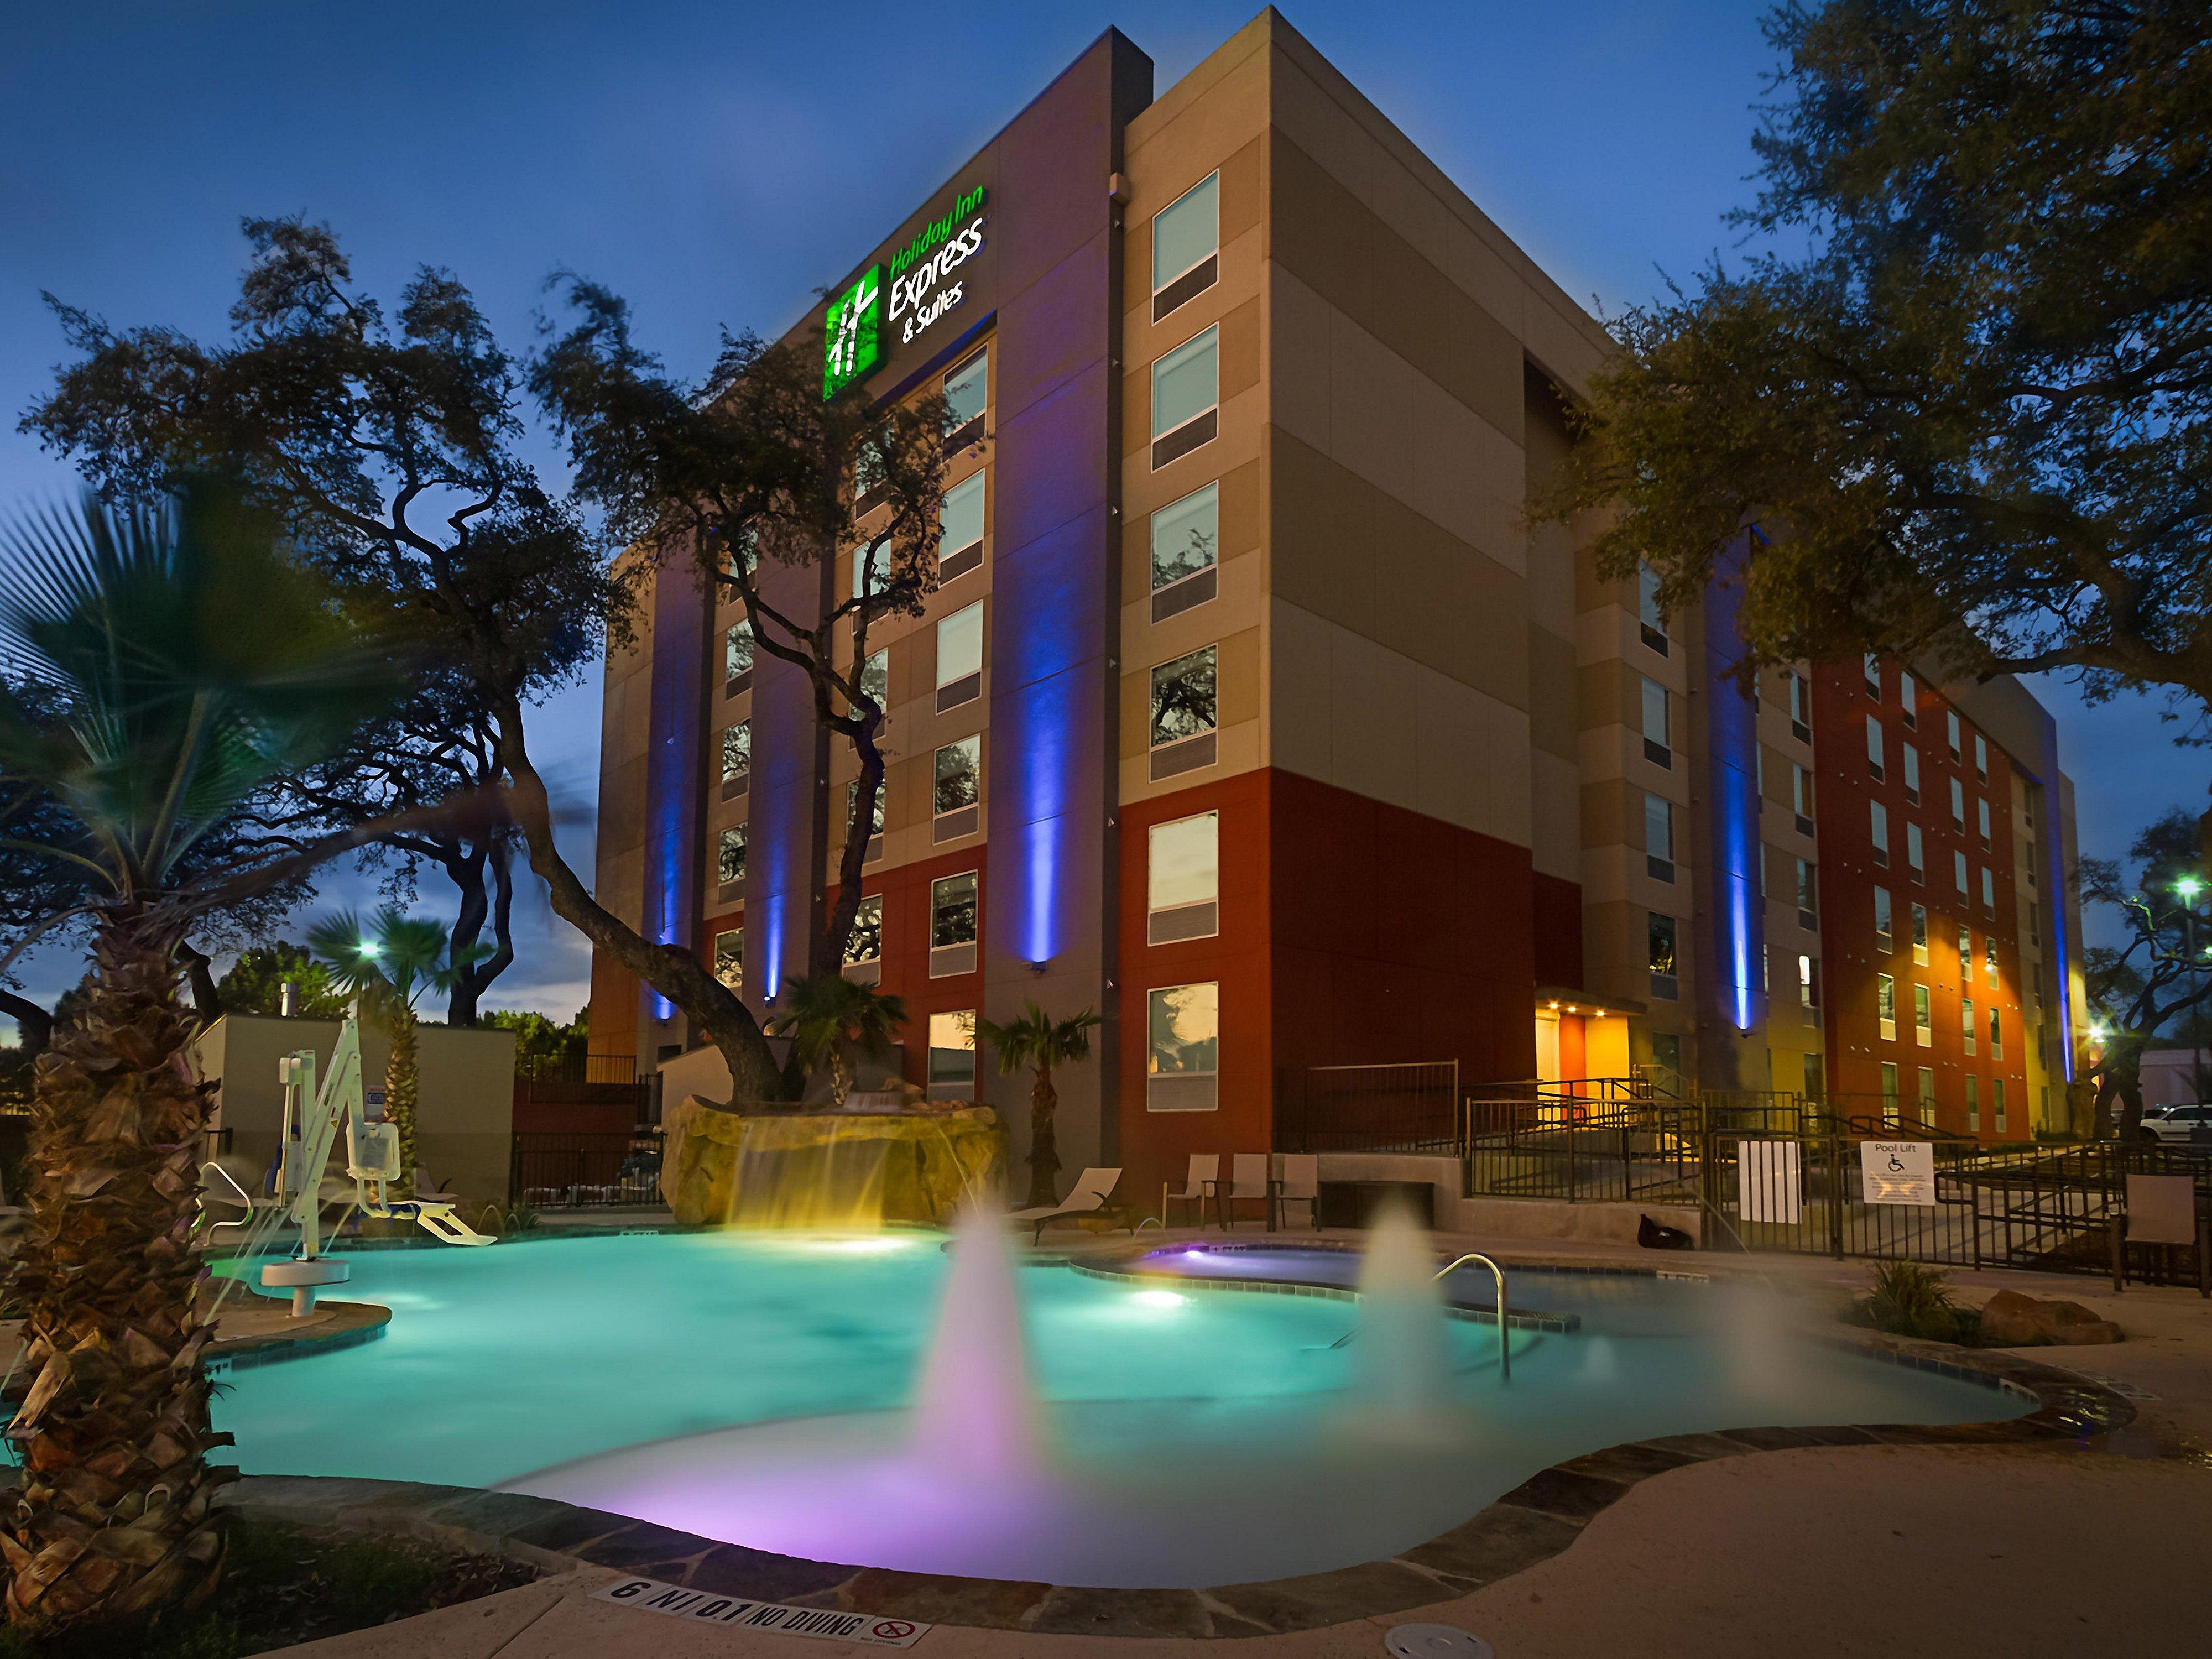 Holiday Inn Express & Suites San Antonio Medical Ctr North Hotel